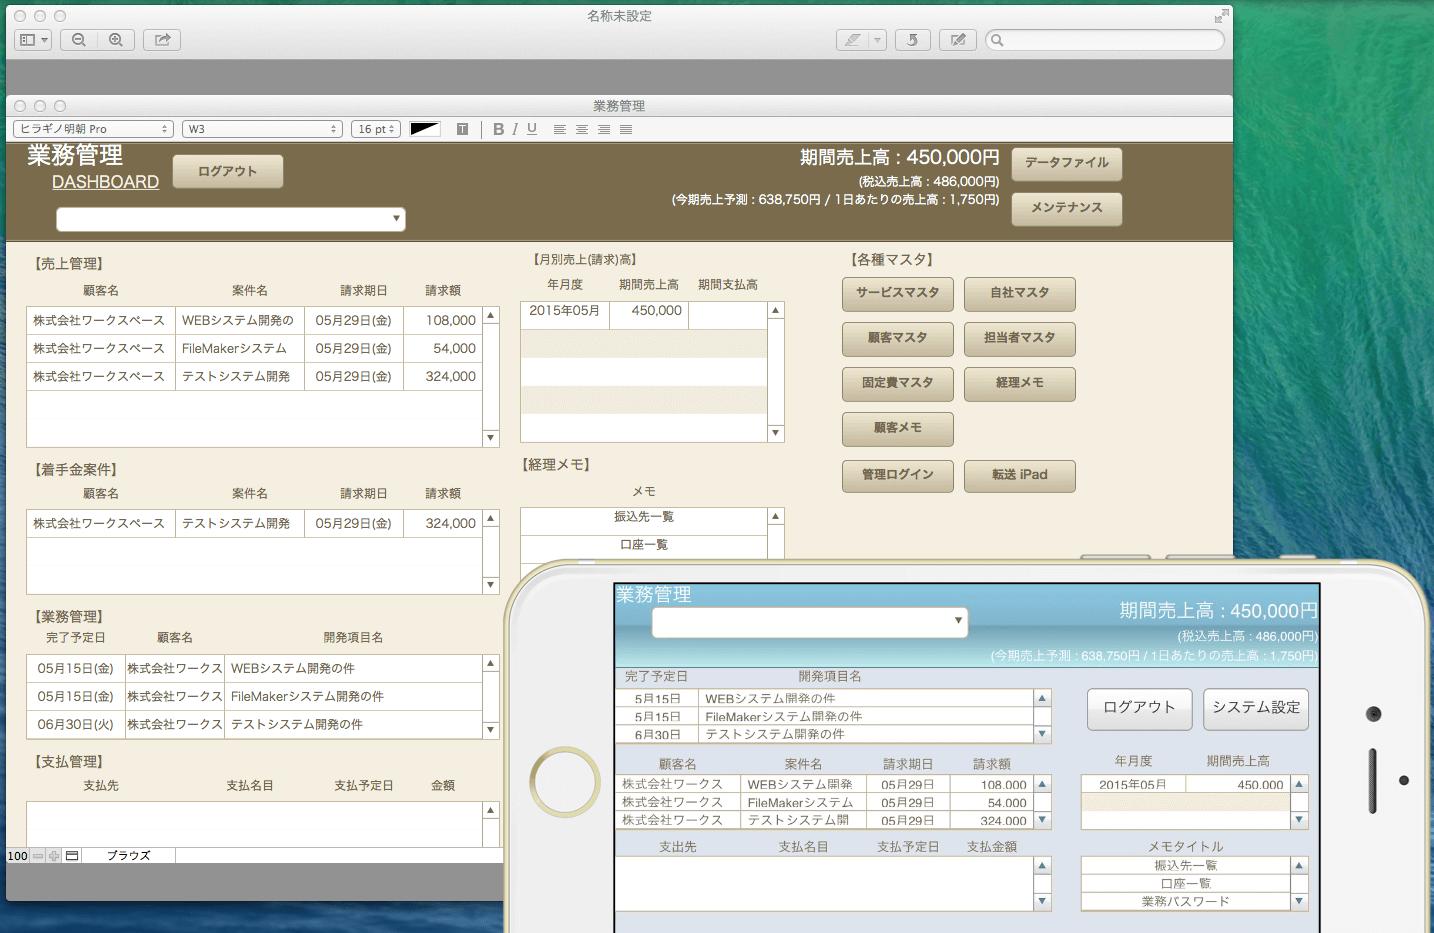 FileMaker業務管理システム